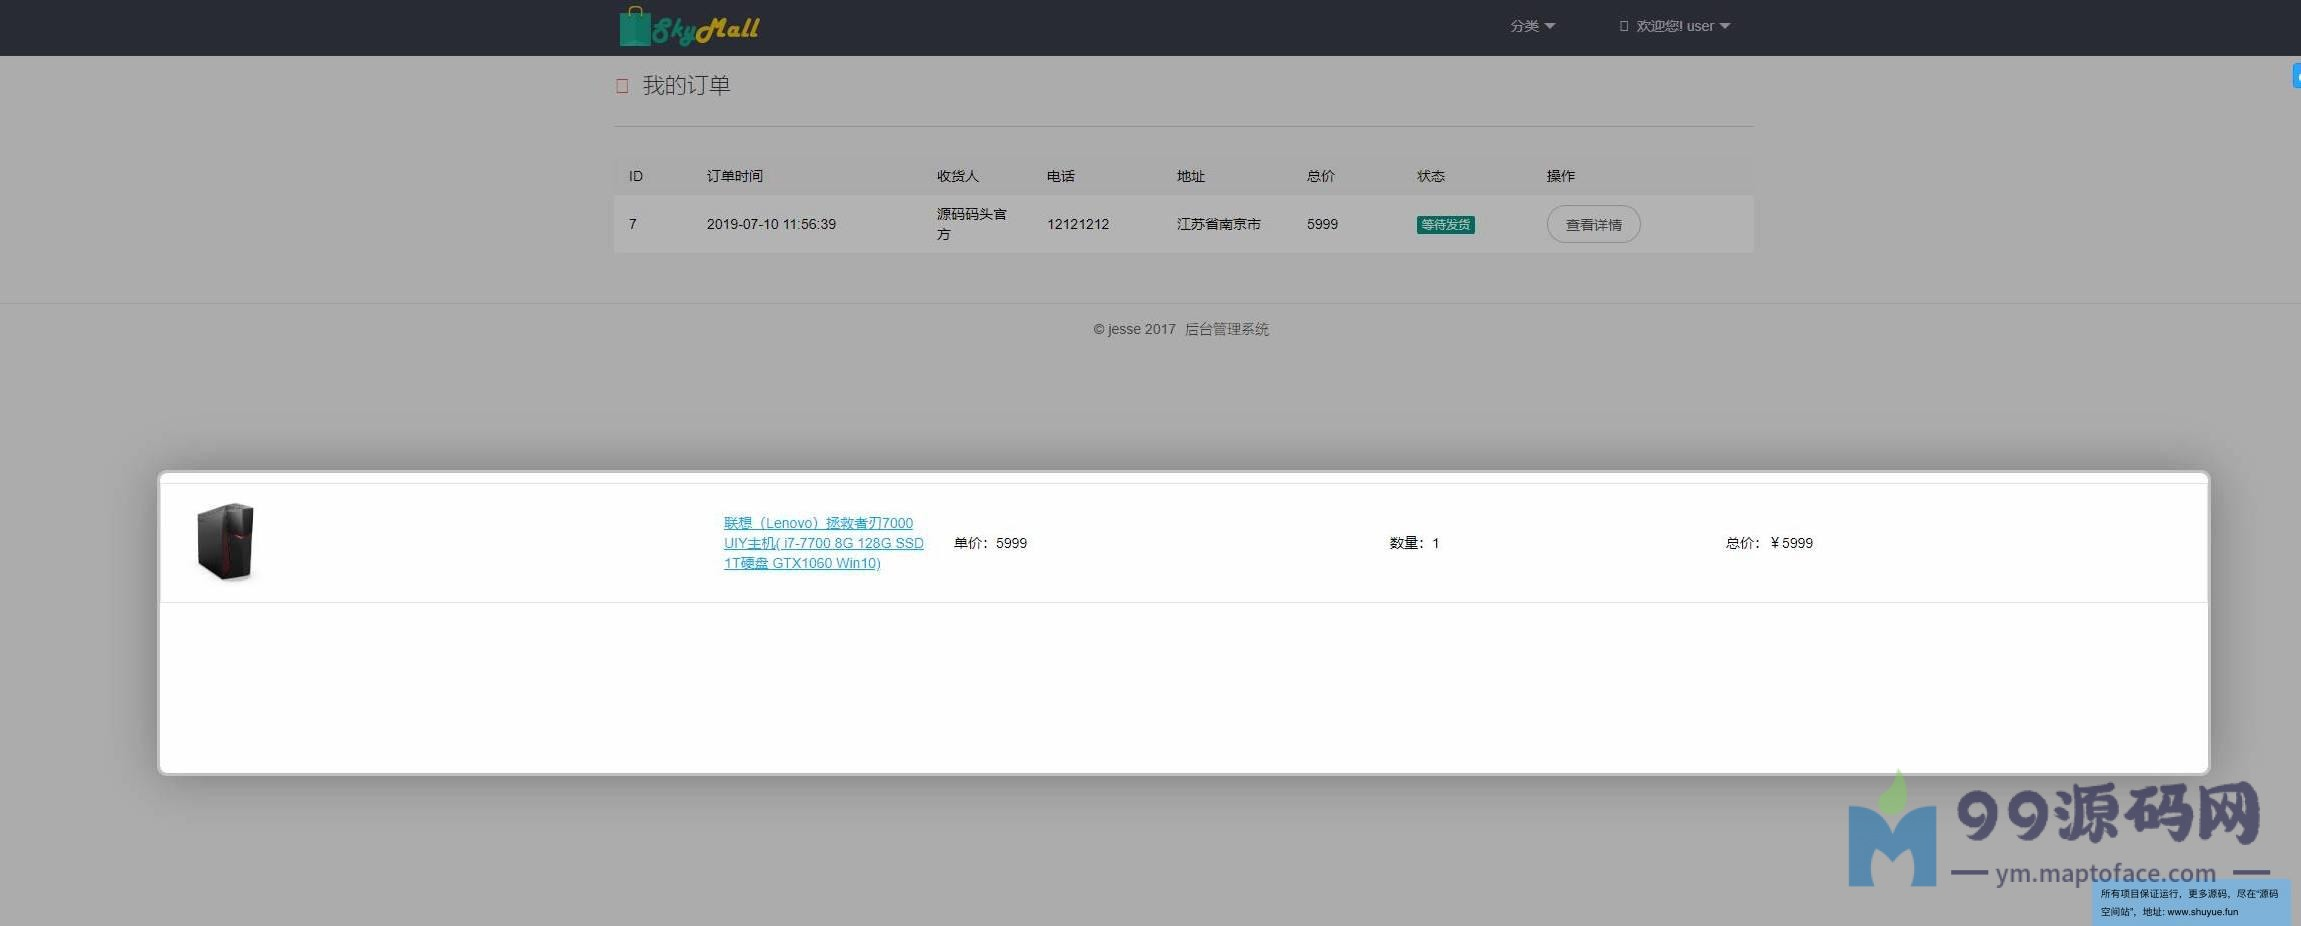 SpringBoot在线电子商城管理系统(含论文)